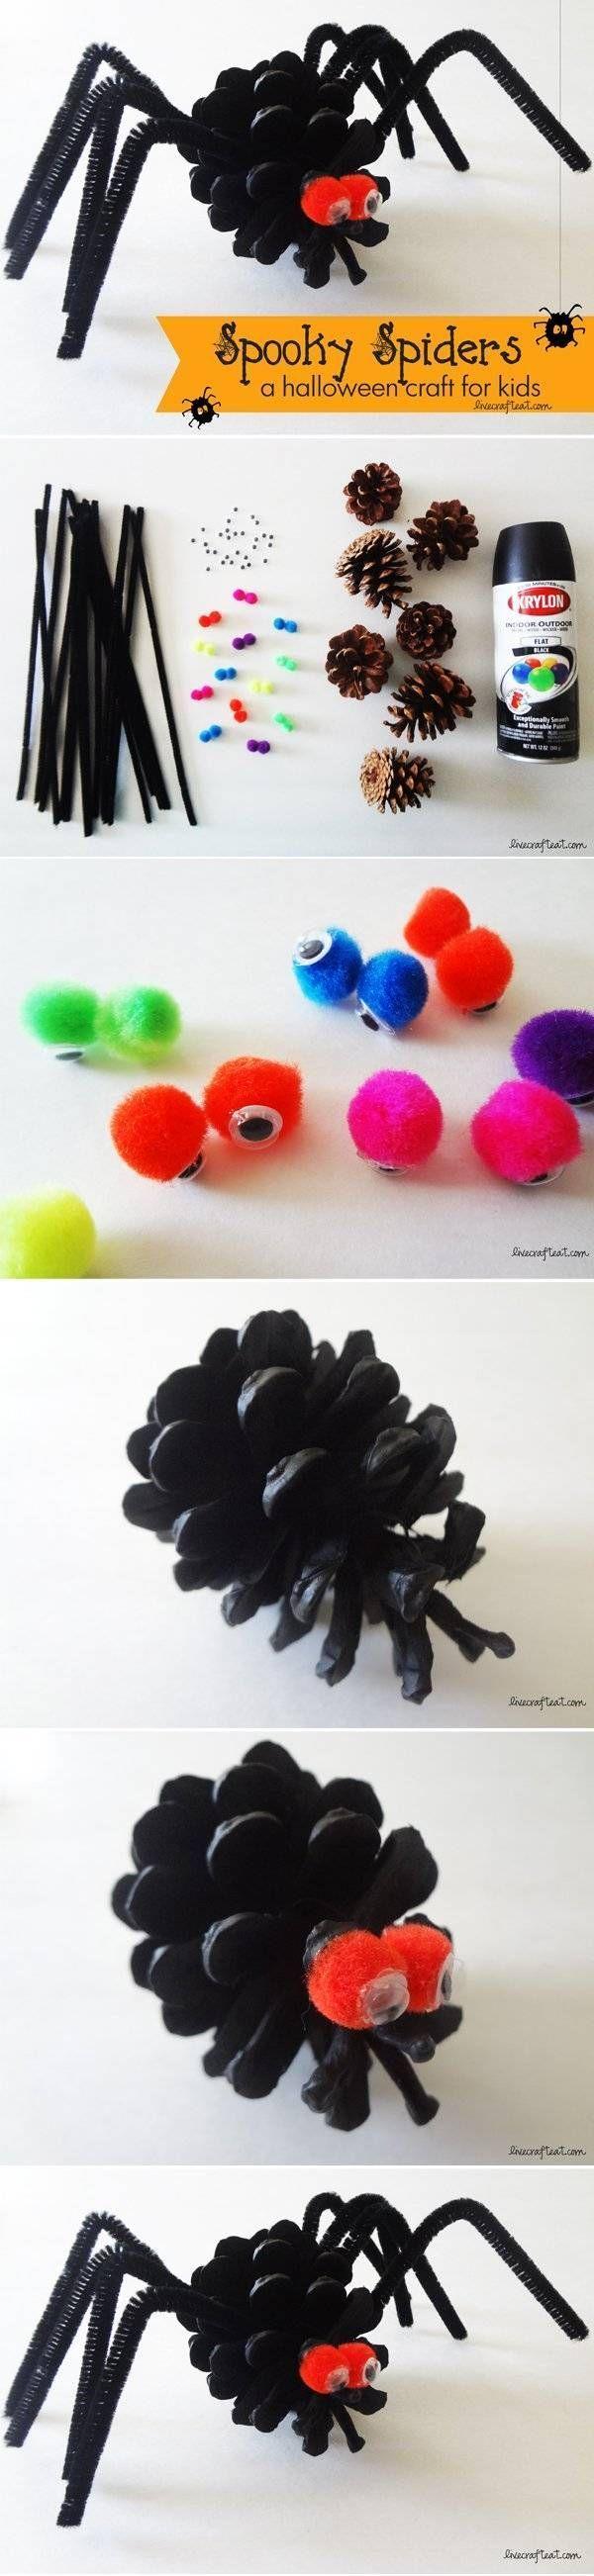 easy halloween craft for kids